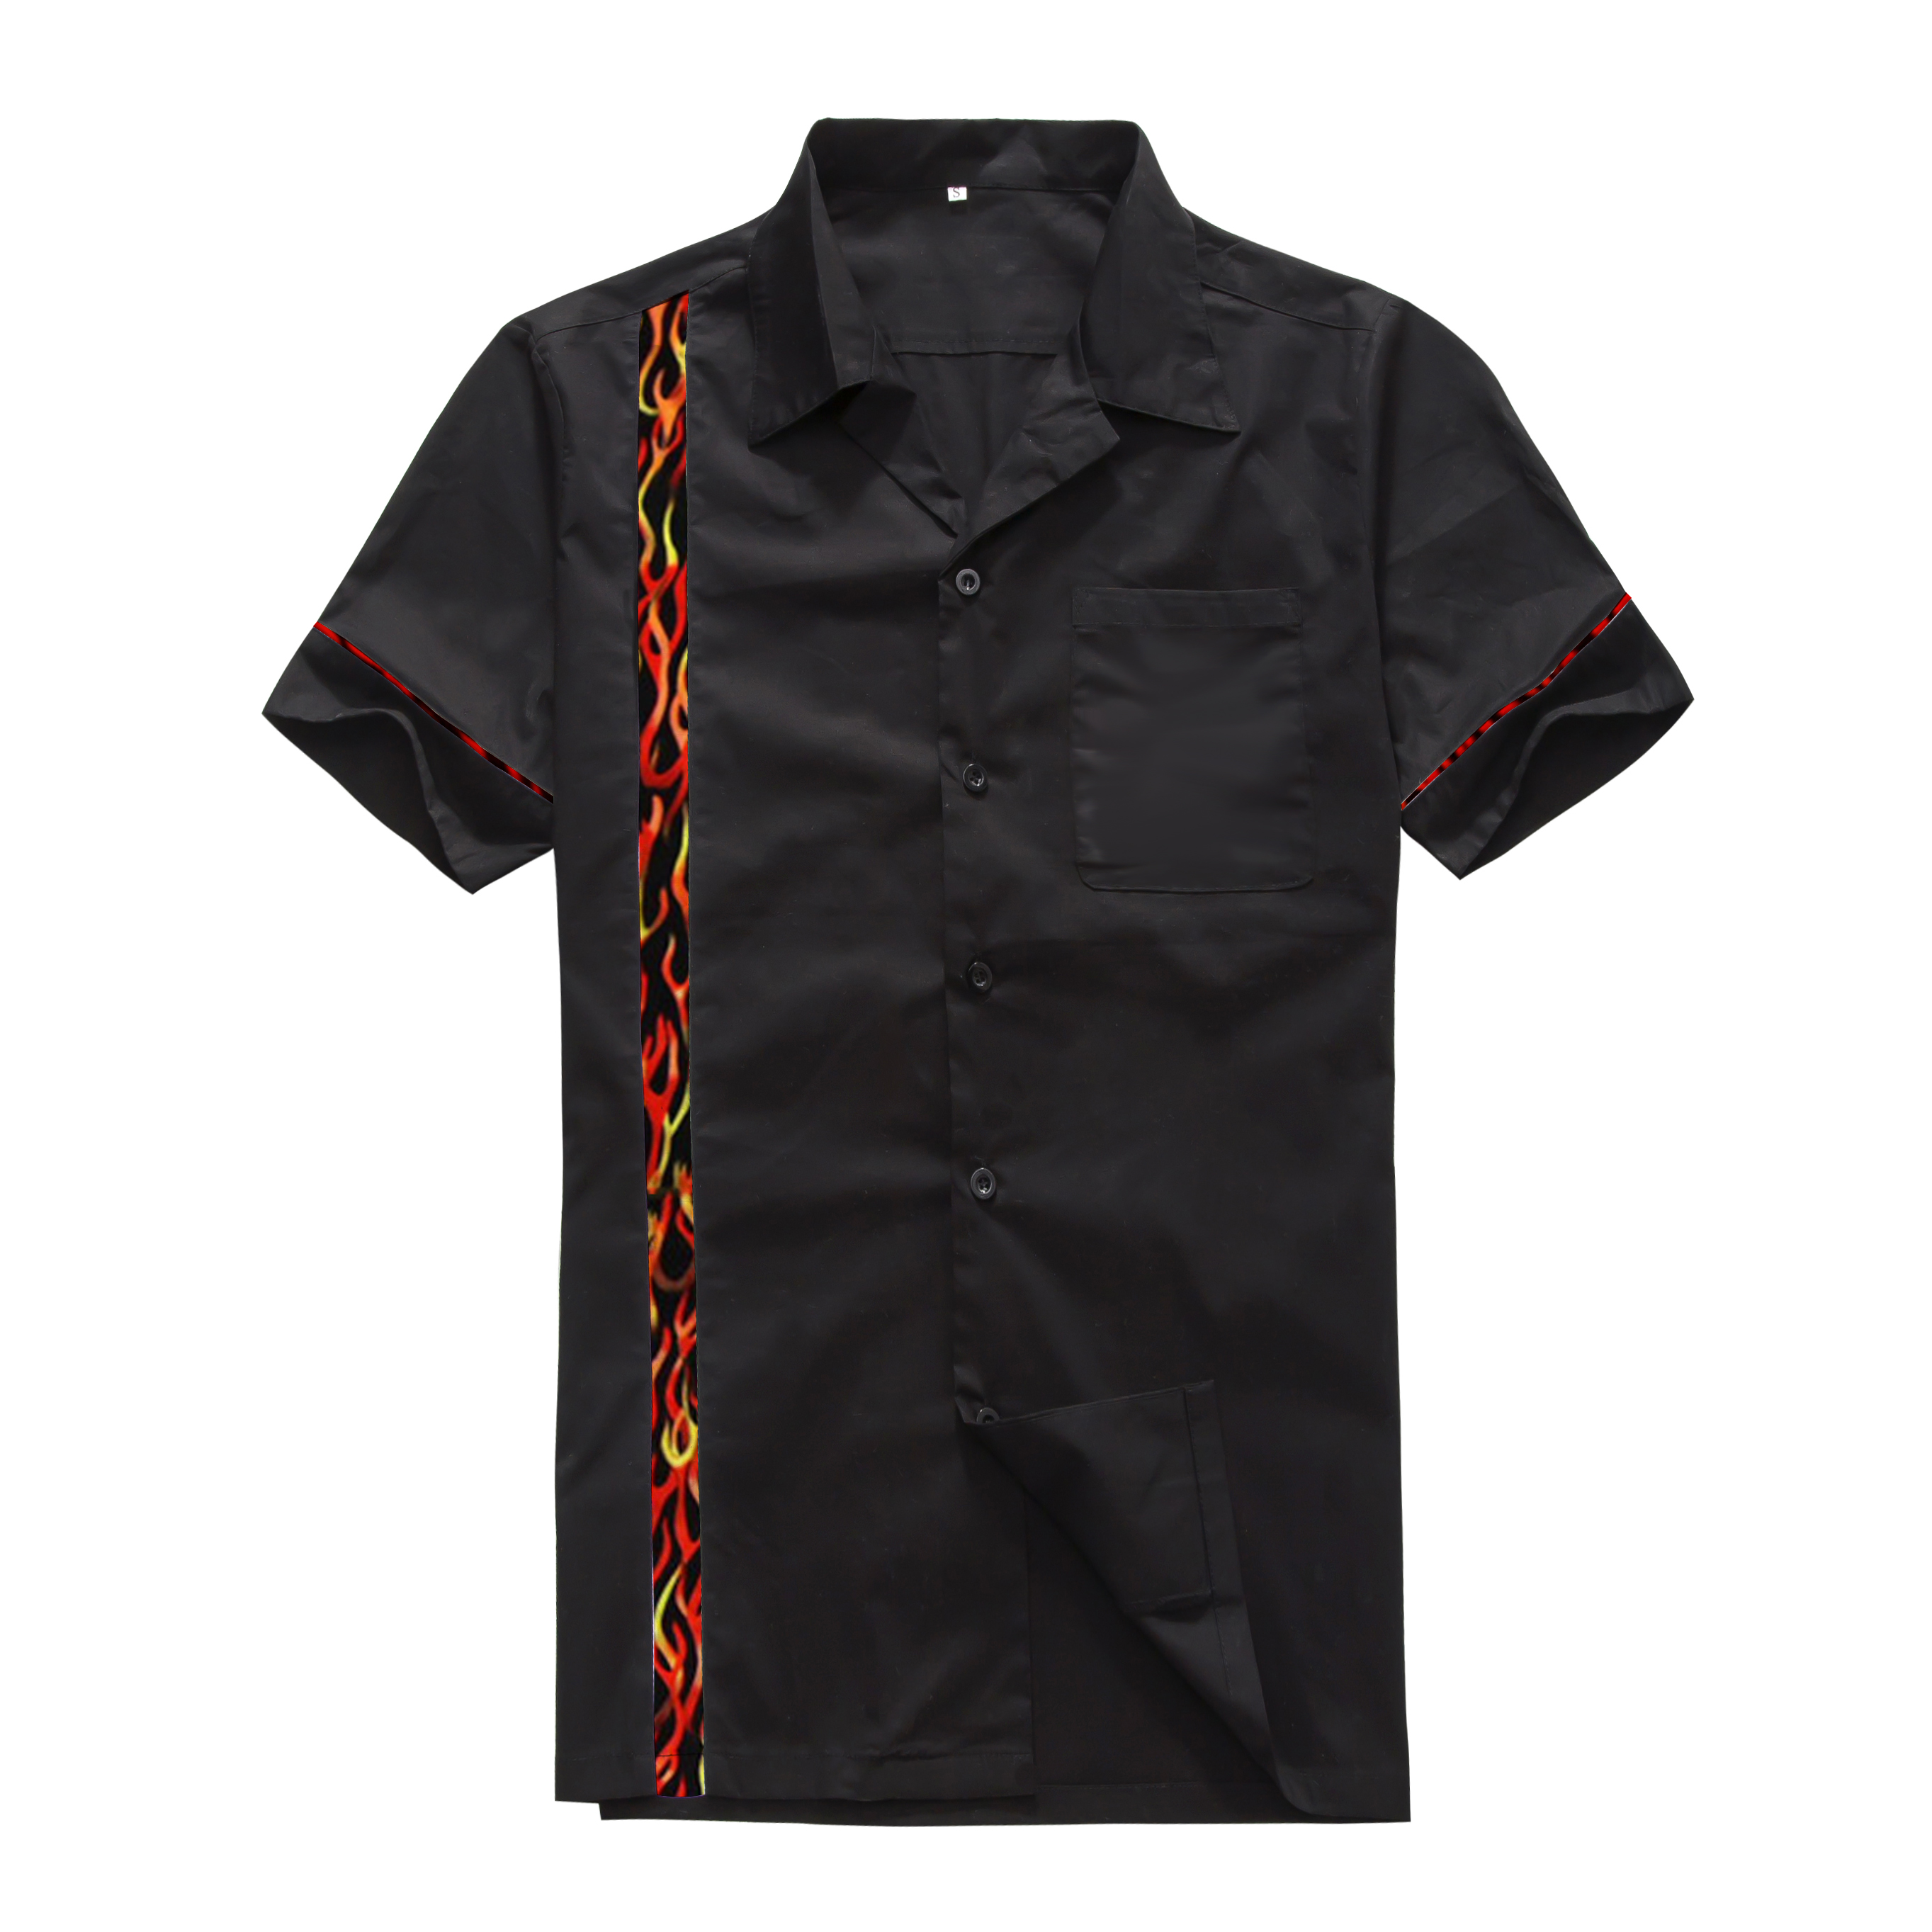 Men S Clothing 1950 S Swing Party Shirt Vintage Large Size Uk Rock N